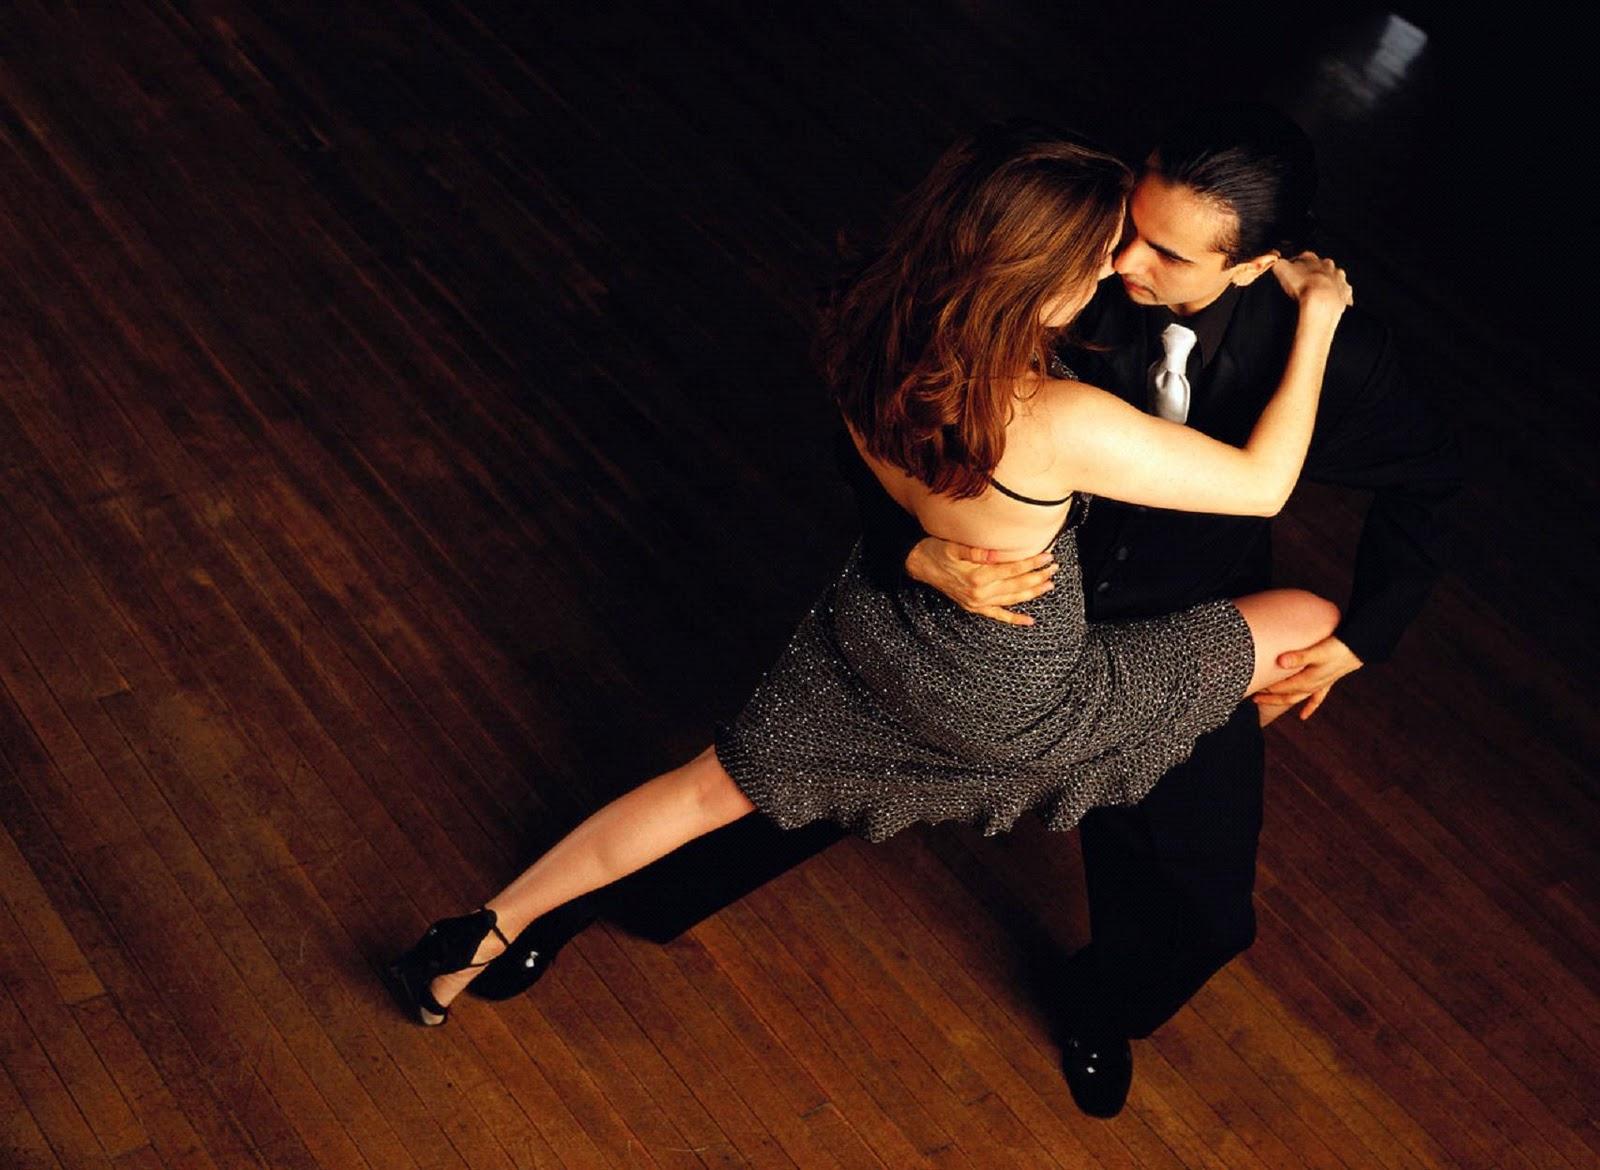 albany-dancing